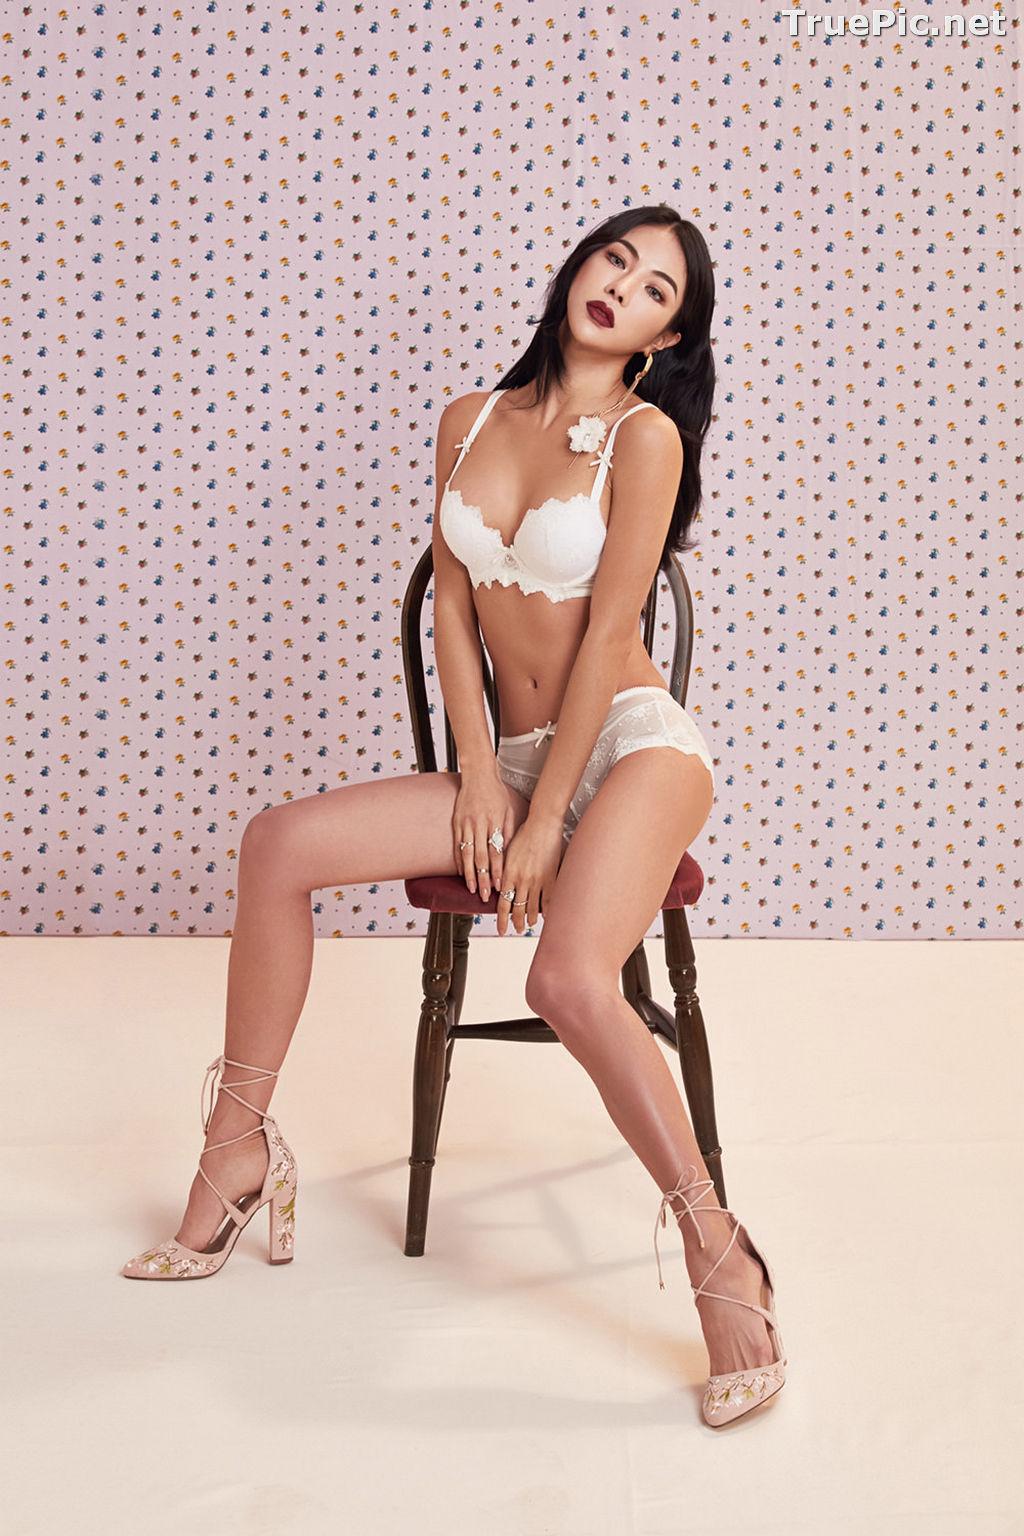 Image Korean Fashion Model - An Seo Rin - White Lingerie and Sleepwear Set - TruePic.net - Picture-6